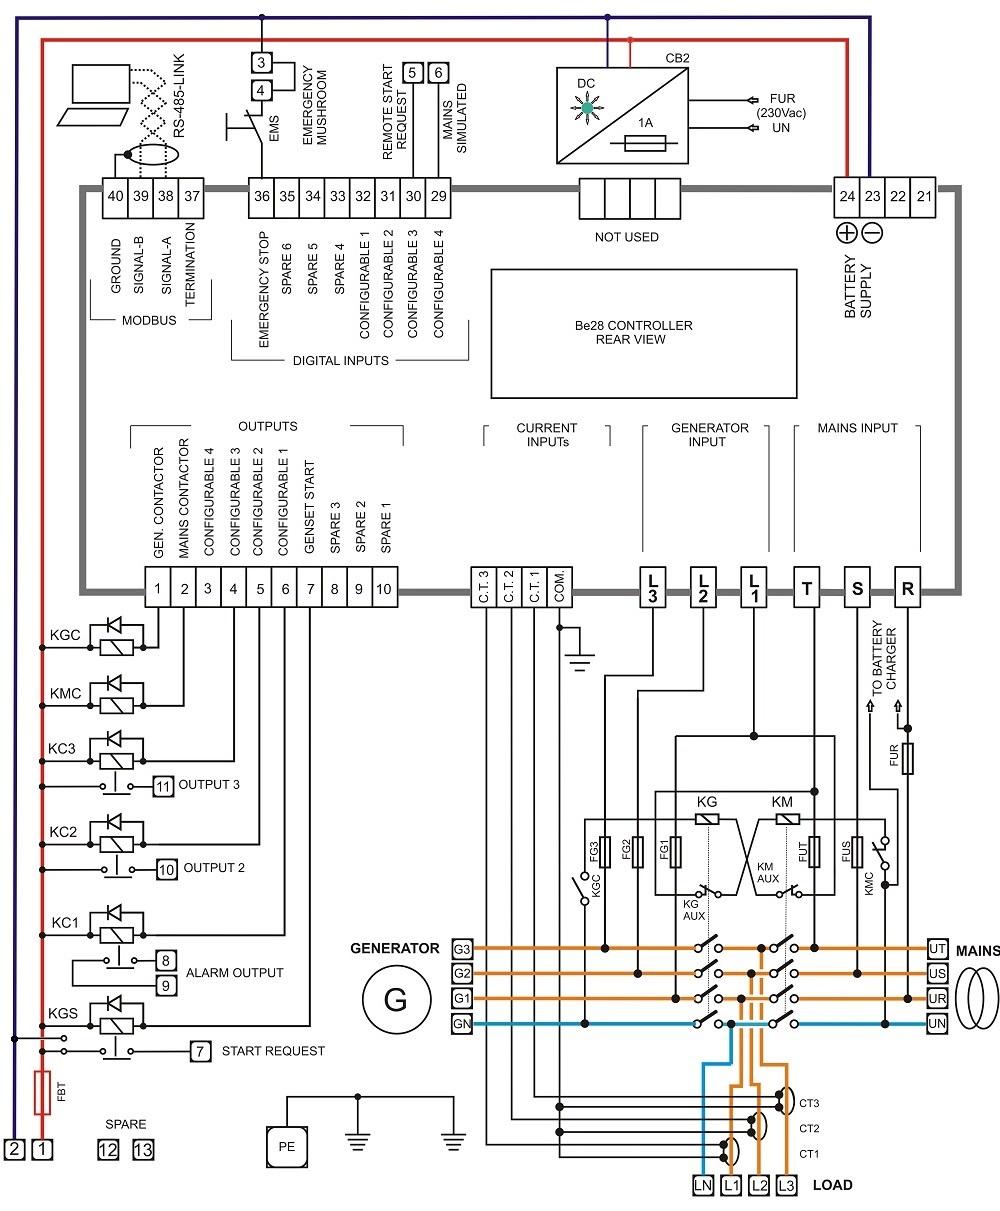 aa1b3d citroen c5 radio wiring diagram wiring resources citroen c1 radio wiring diagram citroen stereo wiring diagram #10